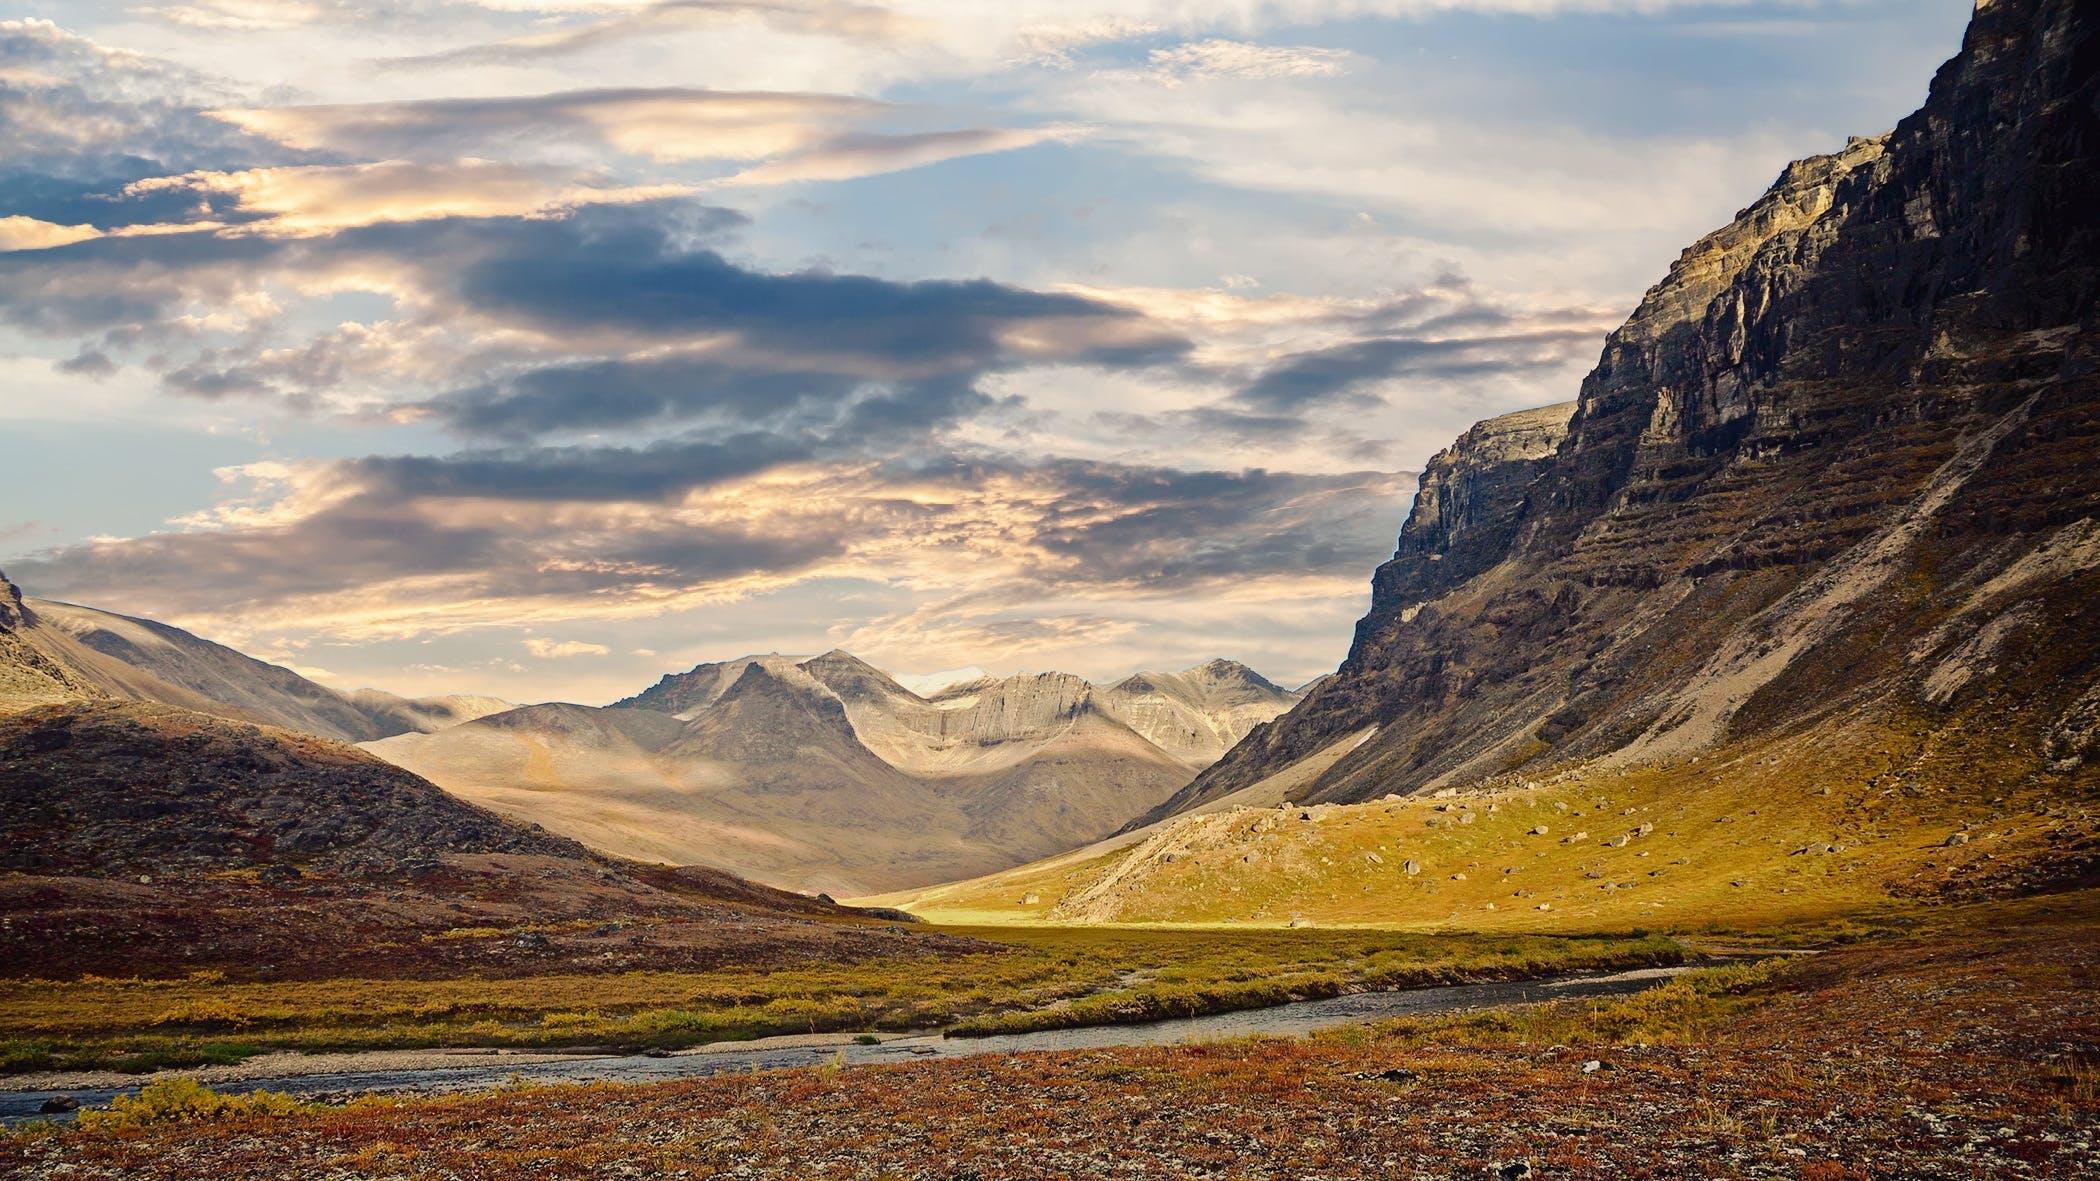 landscape, mountain, mountain range